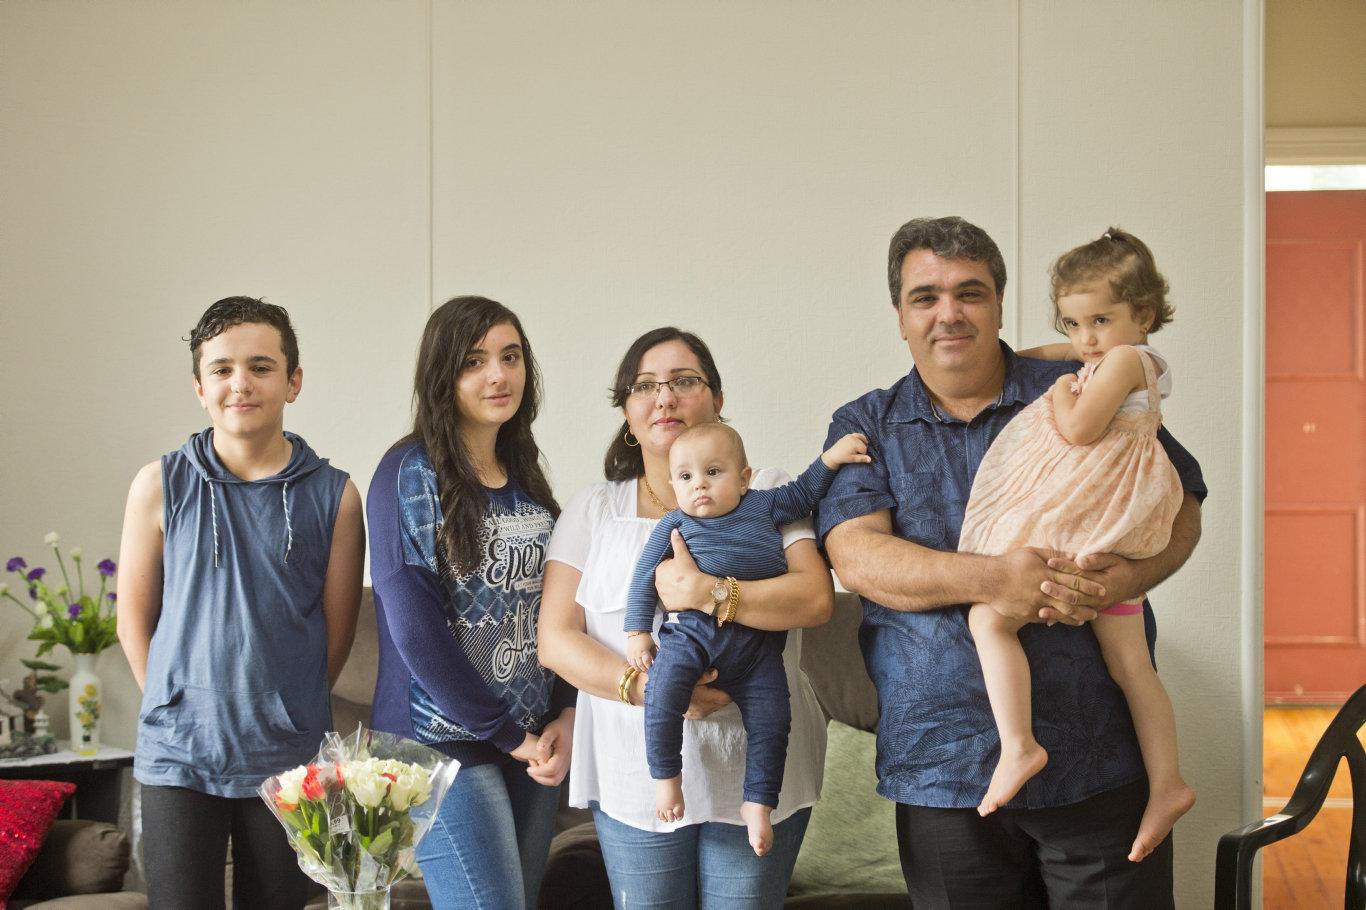 ( From left ) Wissam, Avista, Ramia, Lowrens, Mustafa and Manissa Othman. Monday, 17th Dec, 2018.